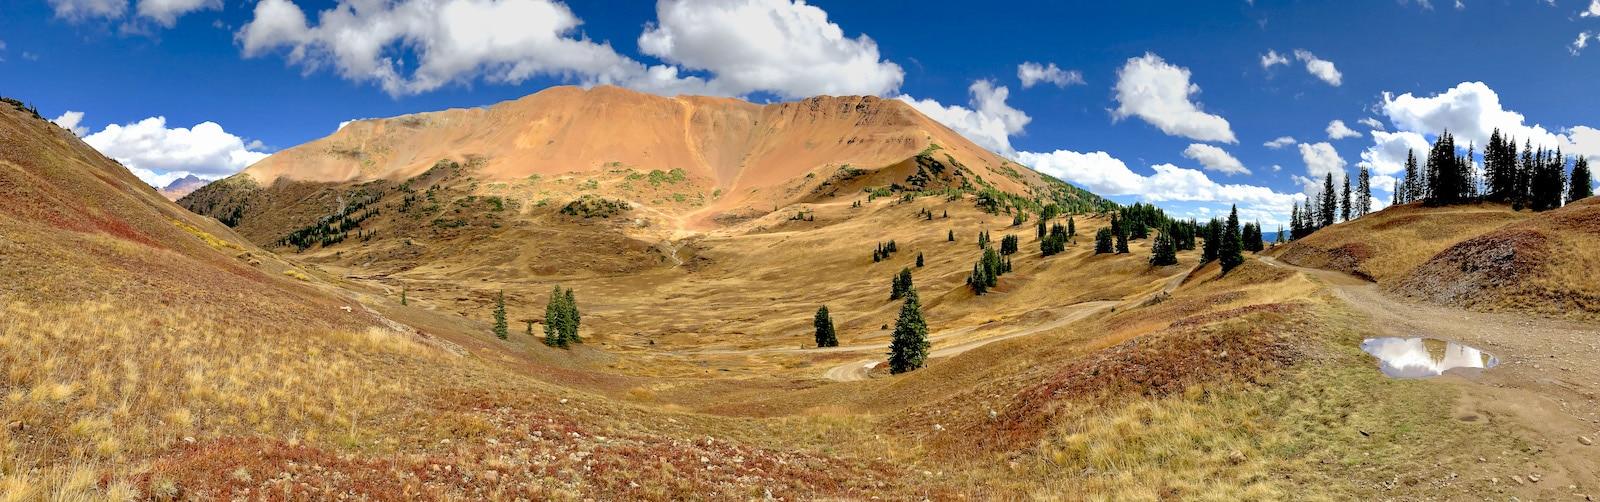 Gunung Baldy Paradise Membagi Colorado